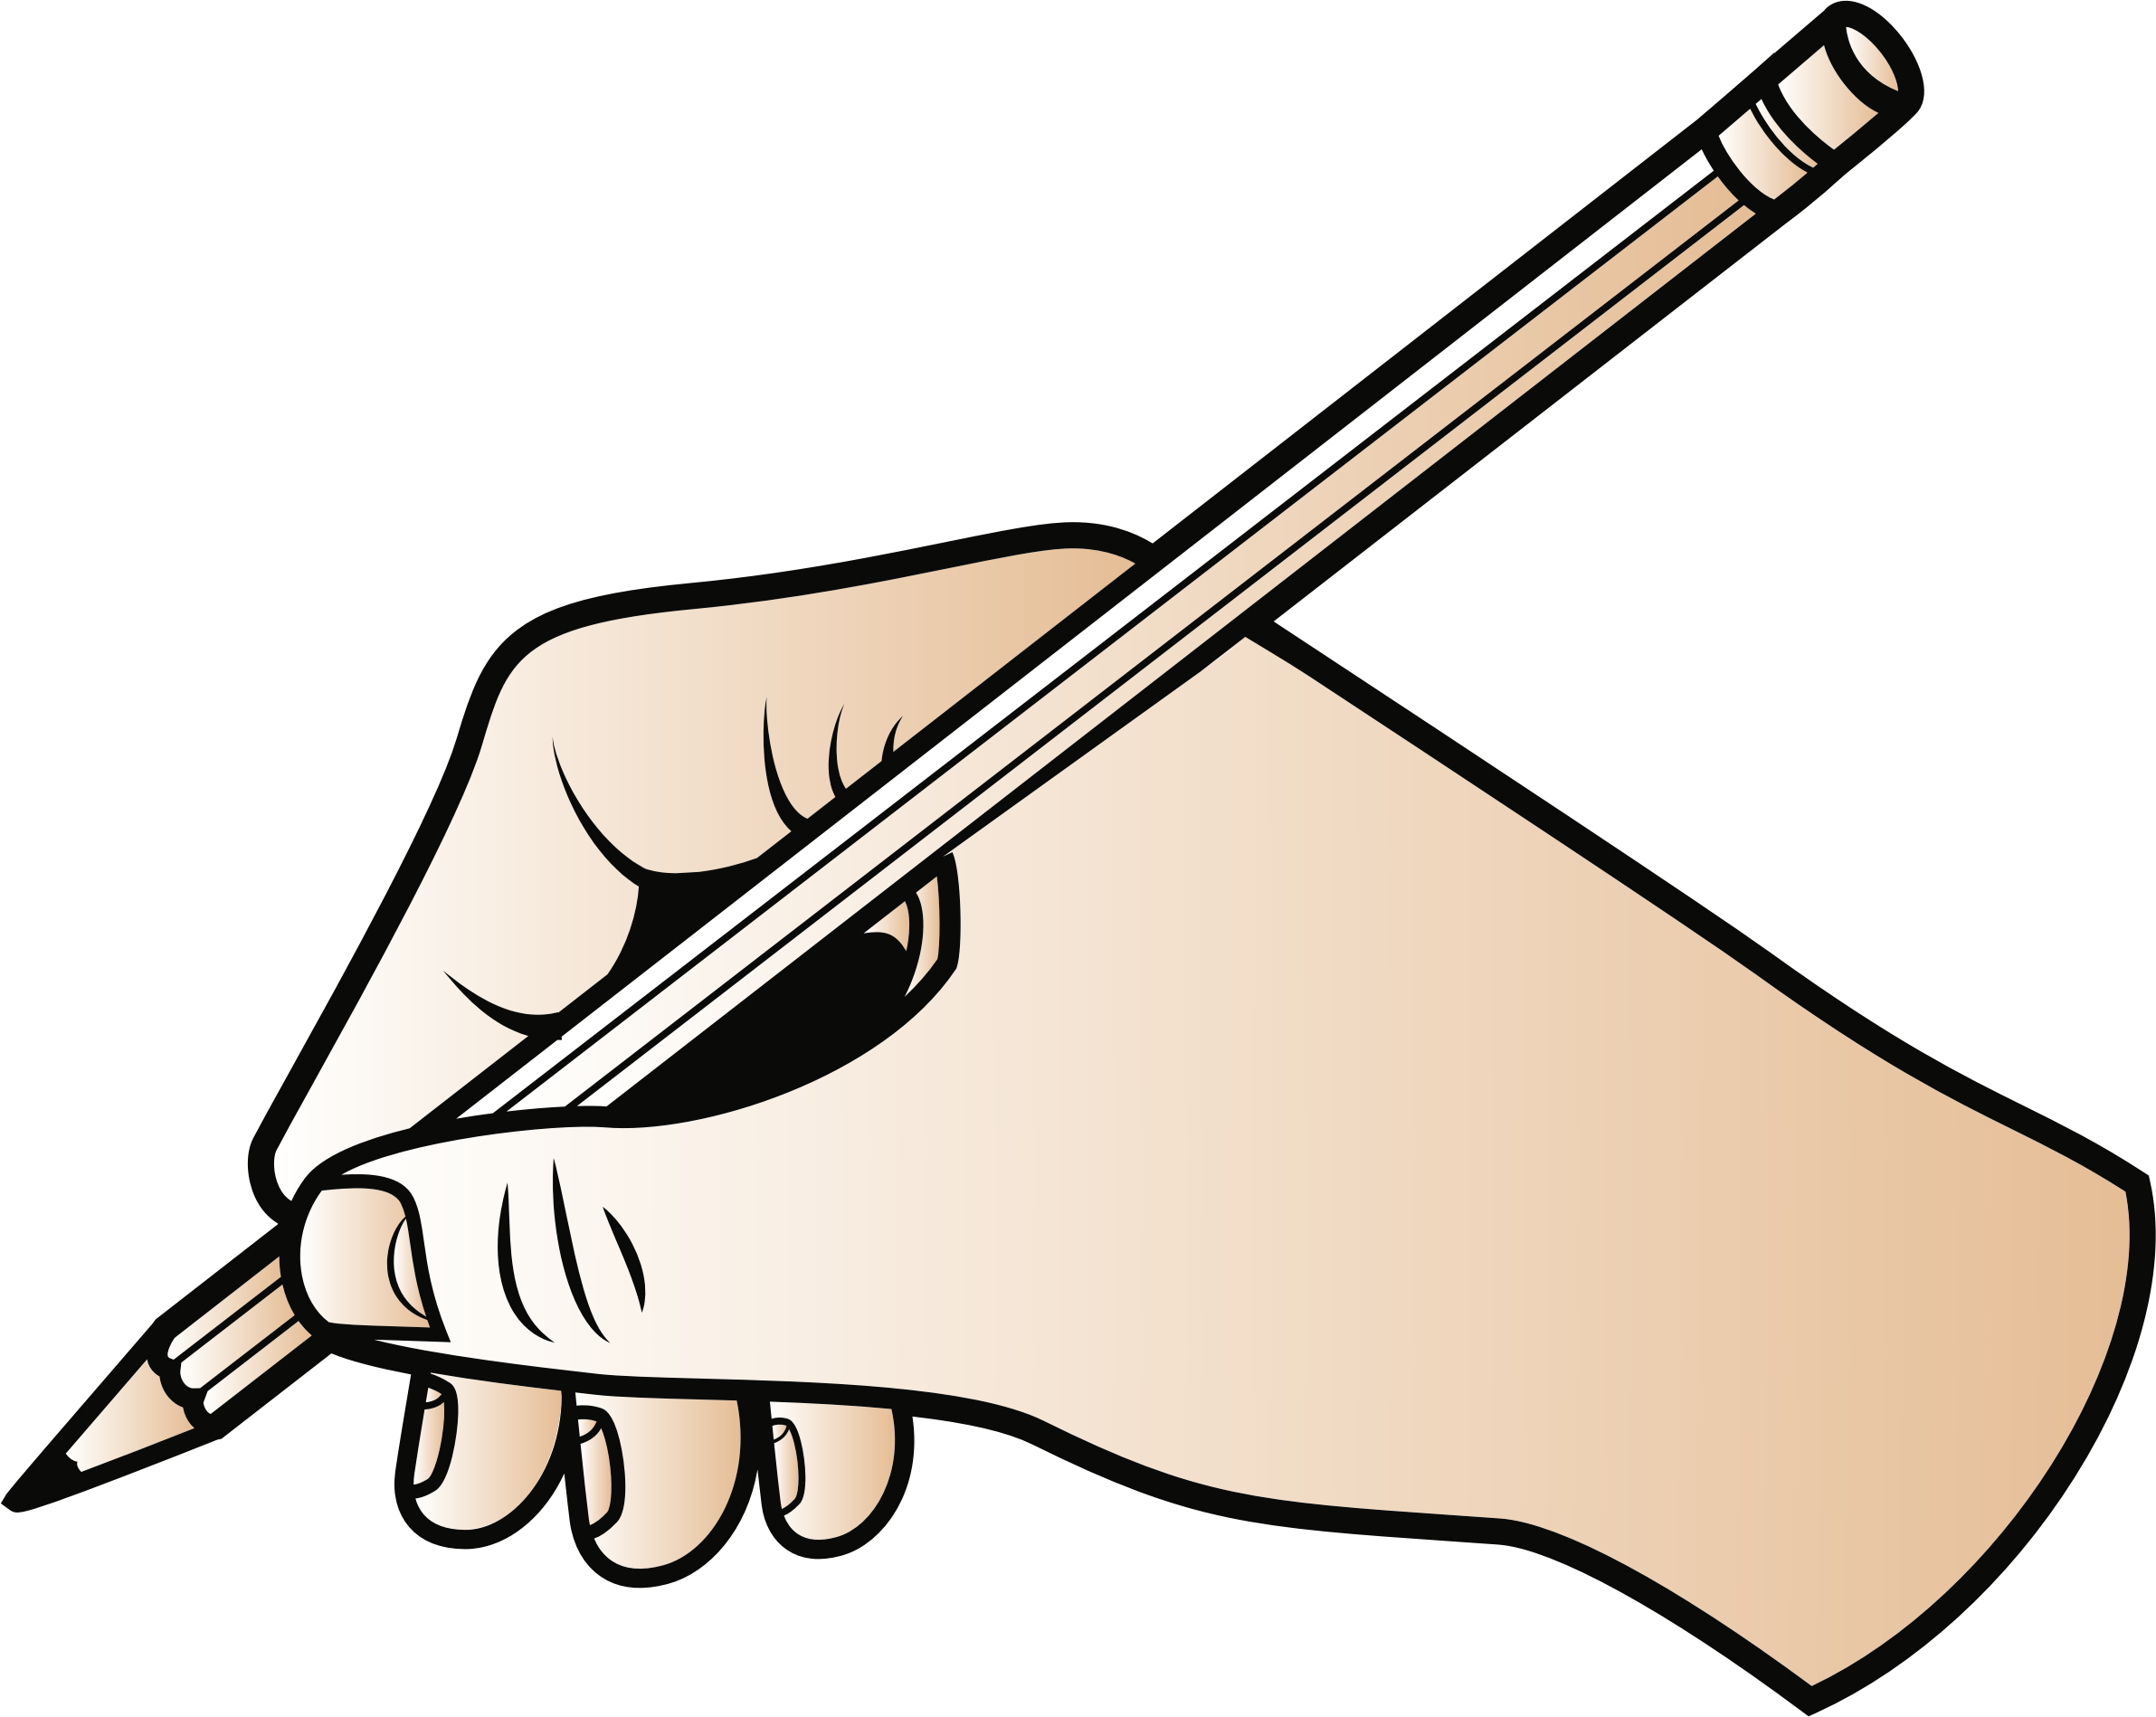 Clipart pencil write, Clipart pencil write Transparent FREE.